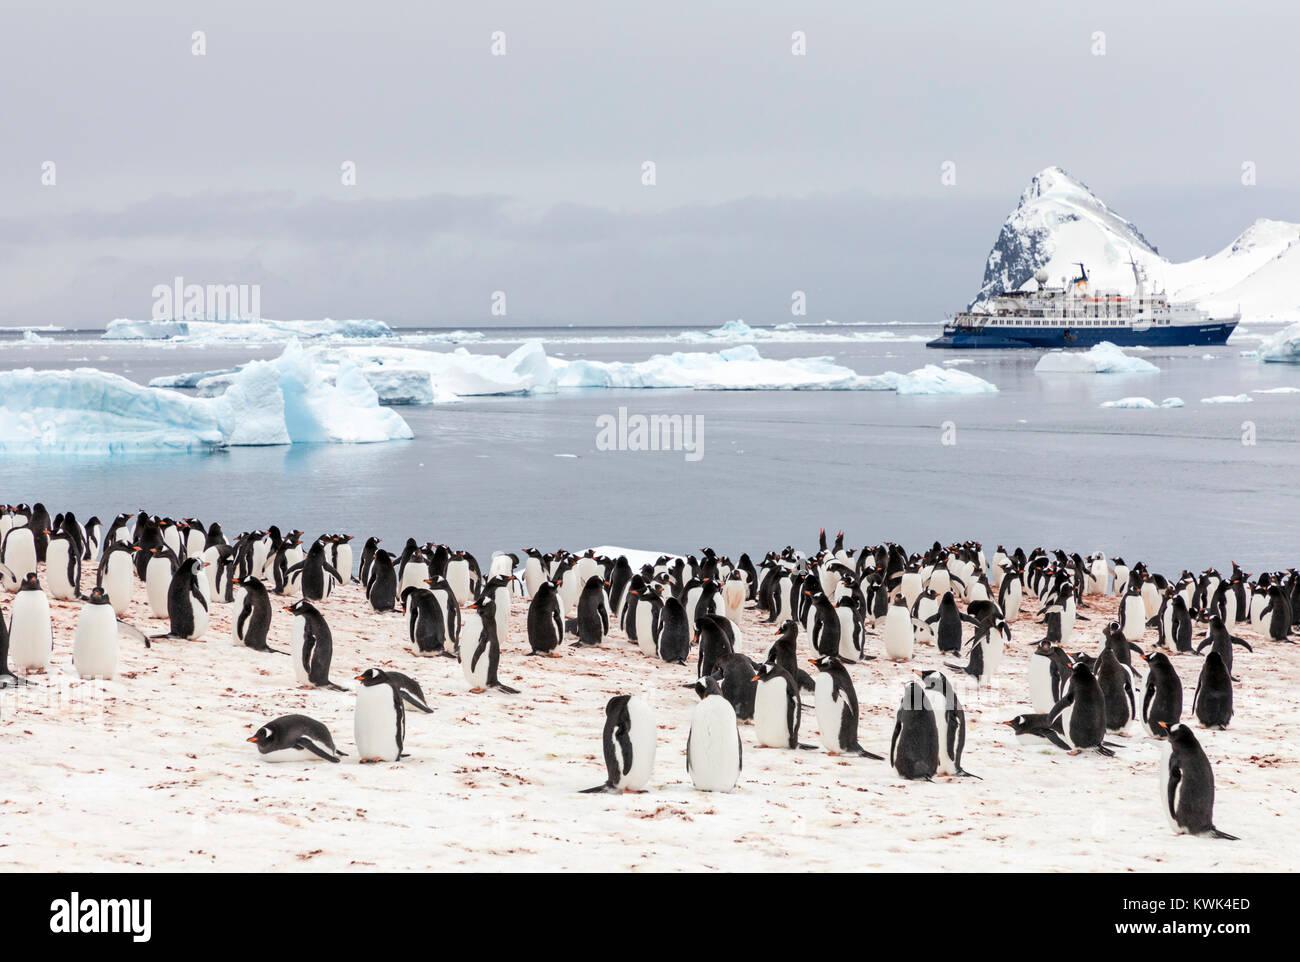 Long-tailed Gentoo penguin; Pygoscelis papua; Cuverville Island; Antarctica; cruise ship Ocean Adventurer beyond - Stock Image